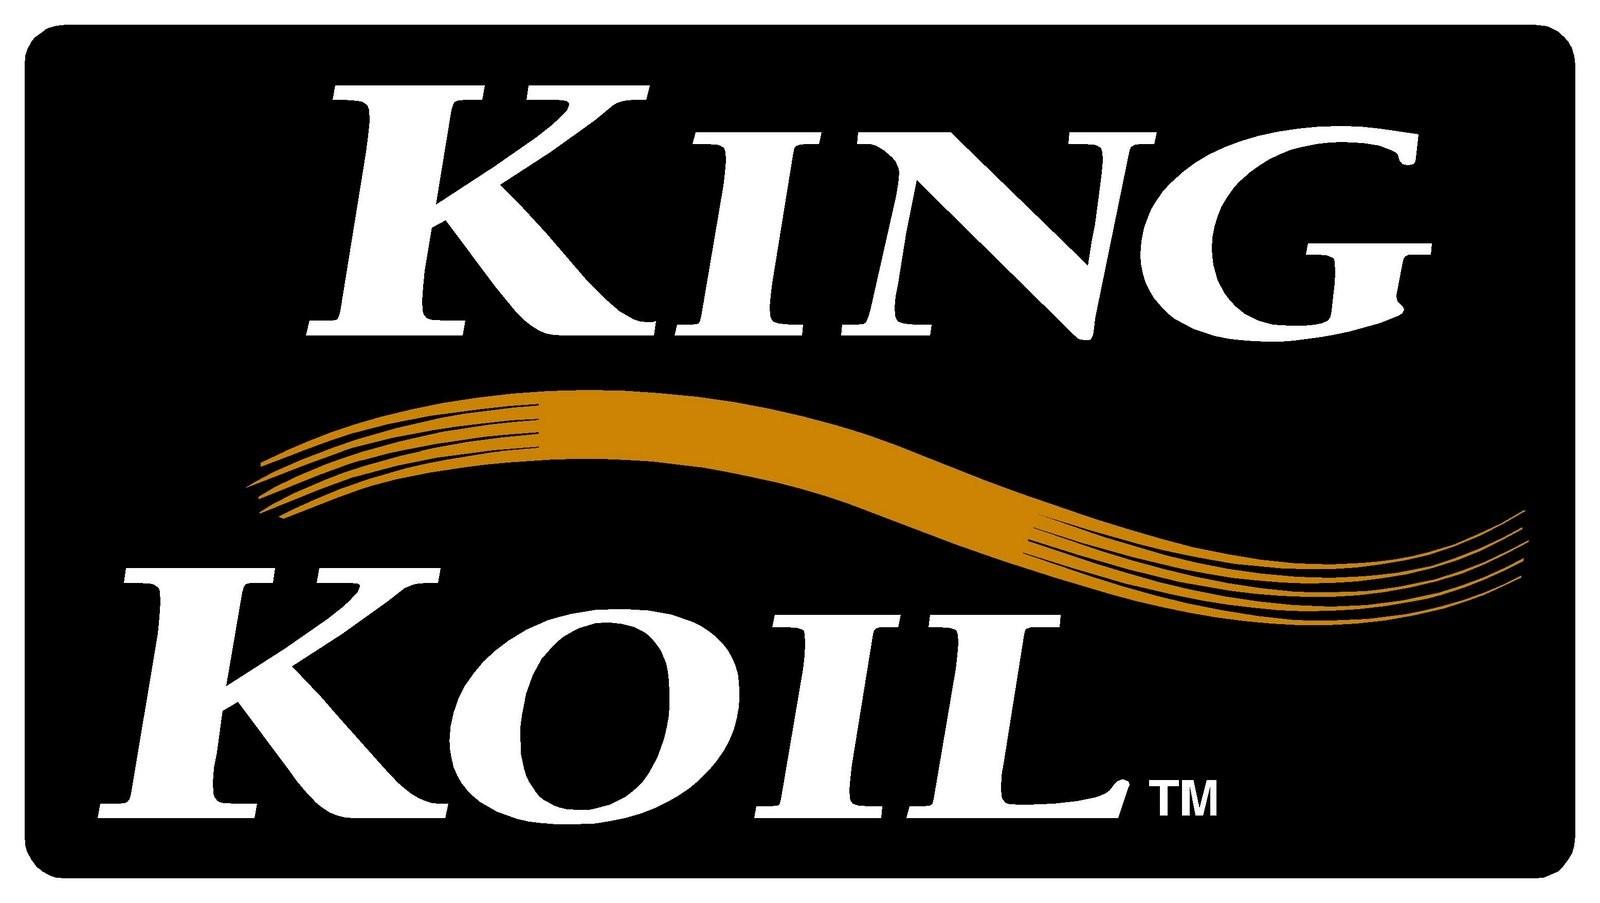 King Koil Mattress